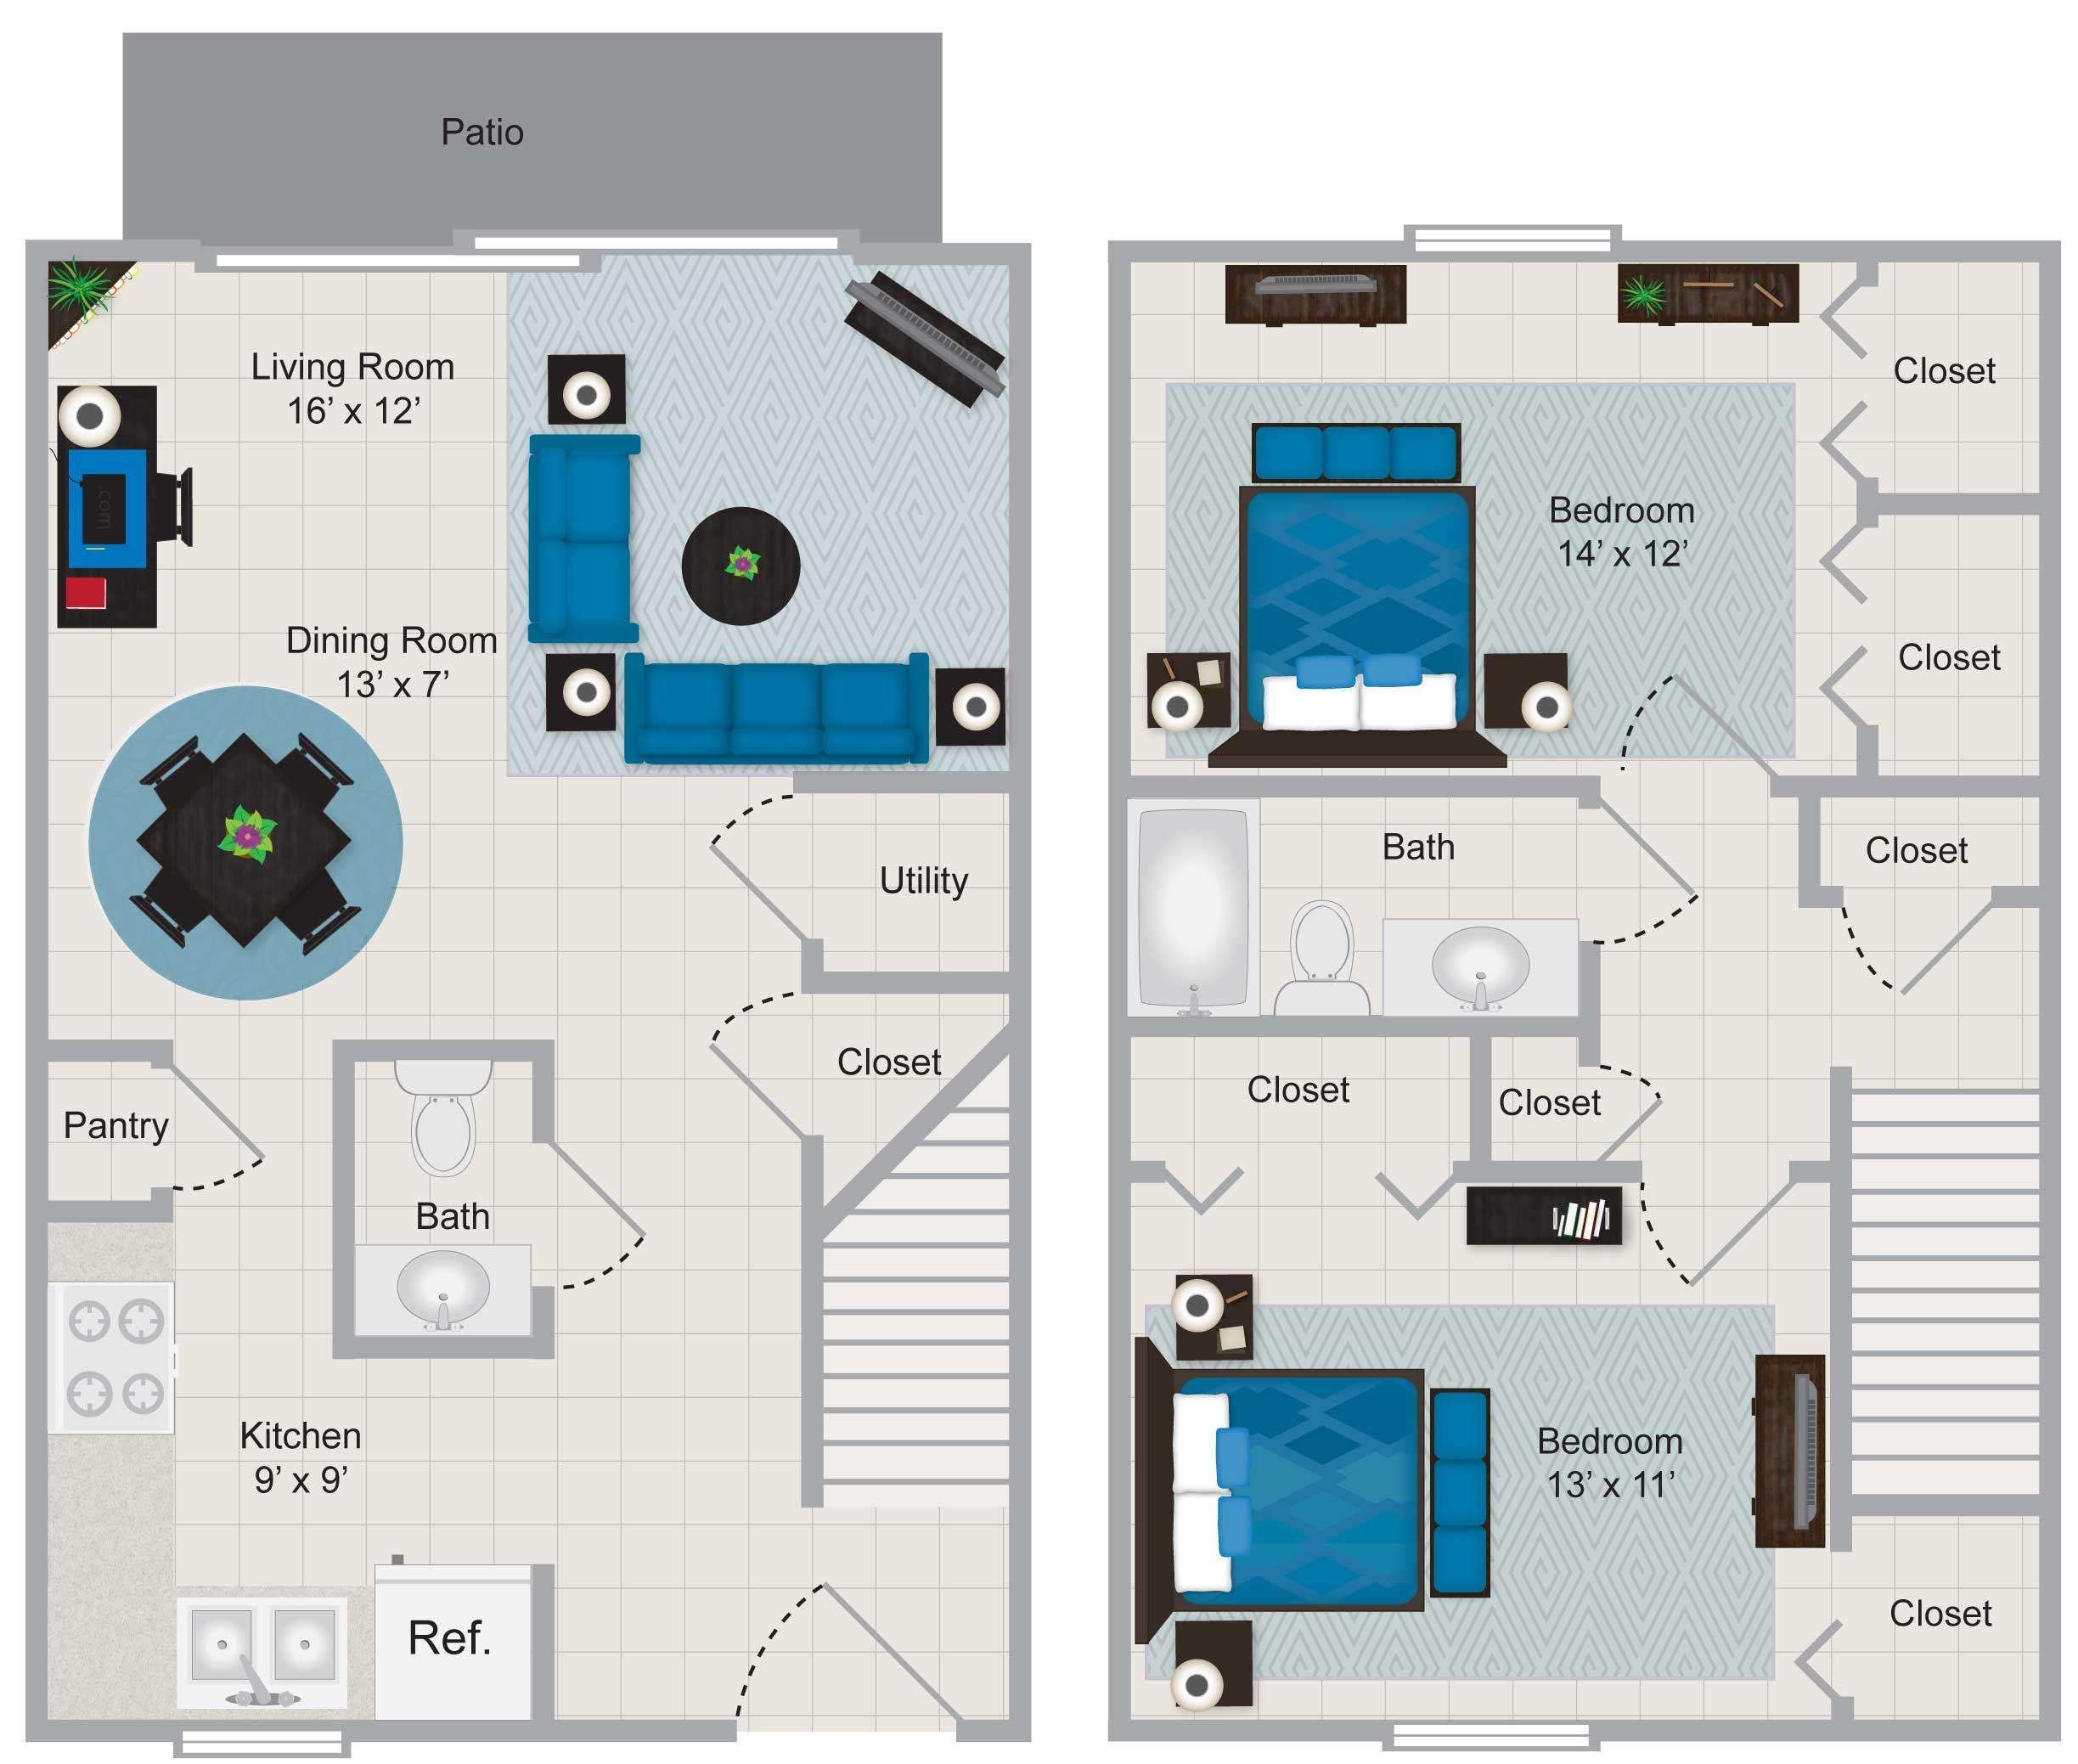 Plan Plan Designer Online House Ideas Inspirations House Floor Plan Designer Online Plans Maker Design House Your Own House Plans House Blueprints House Design